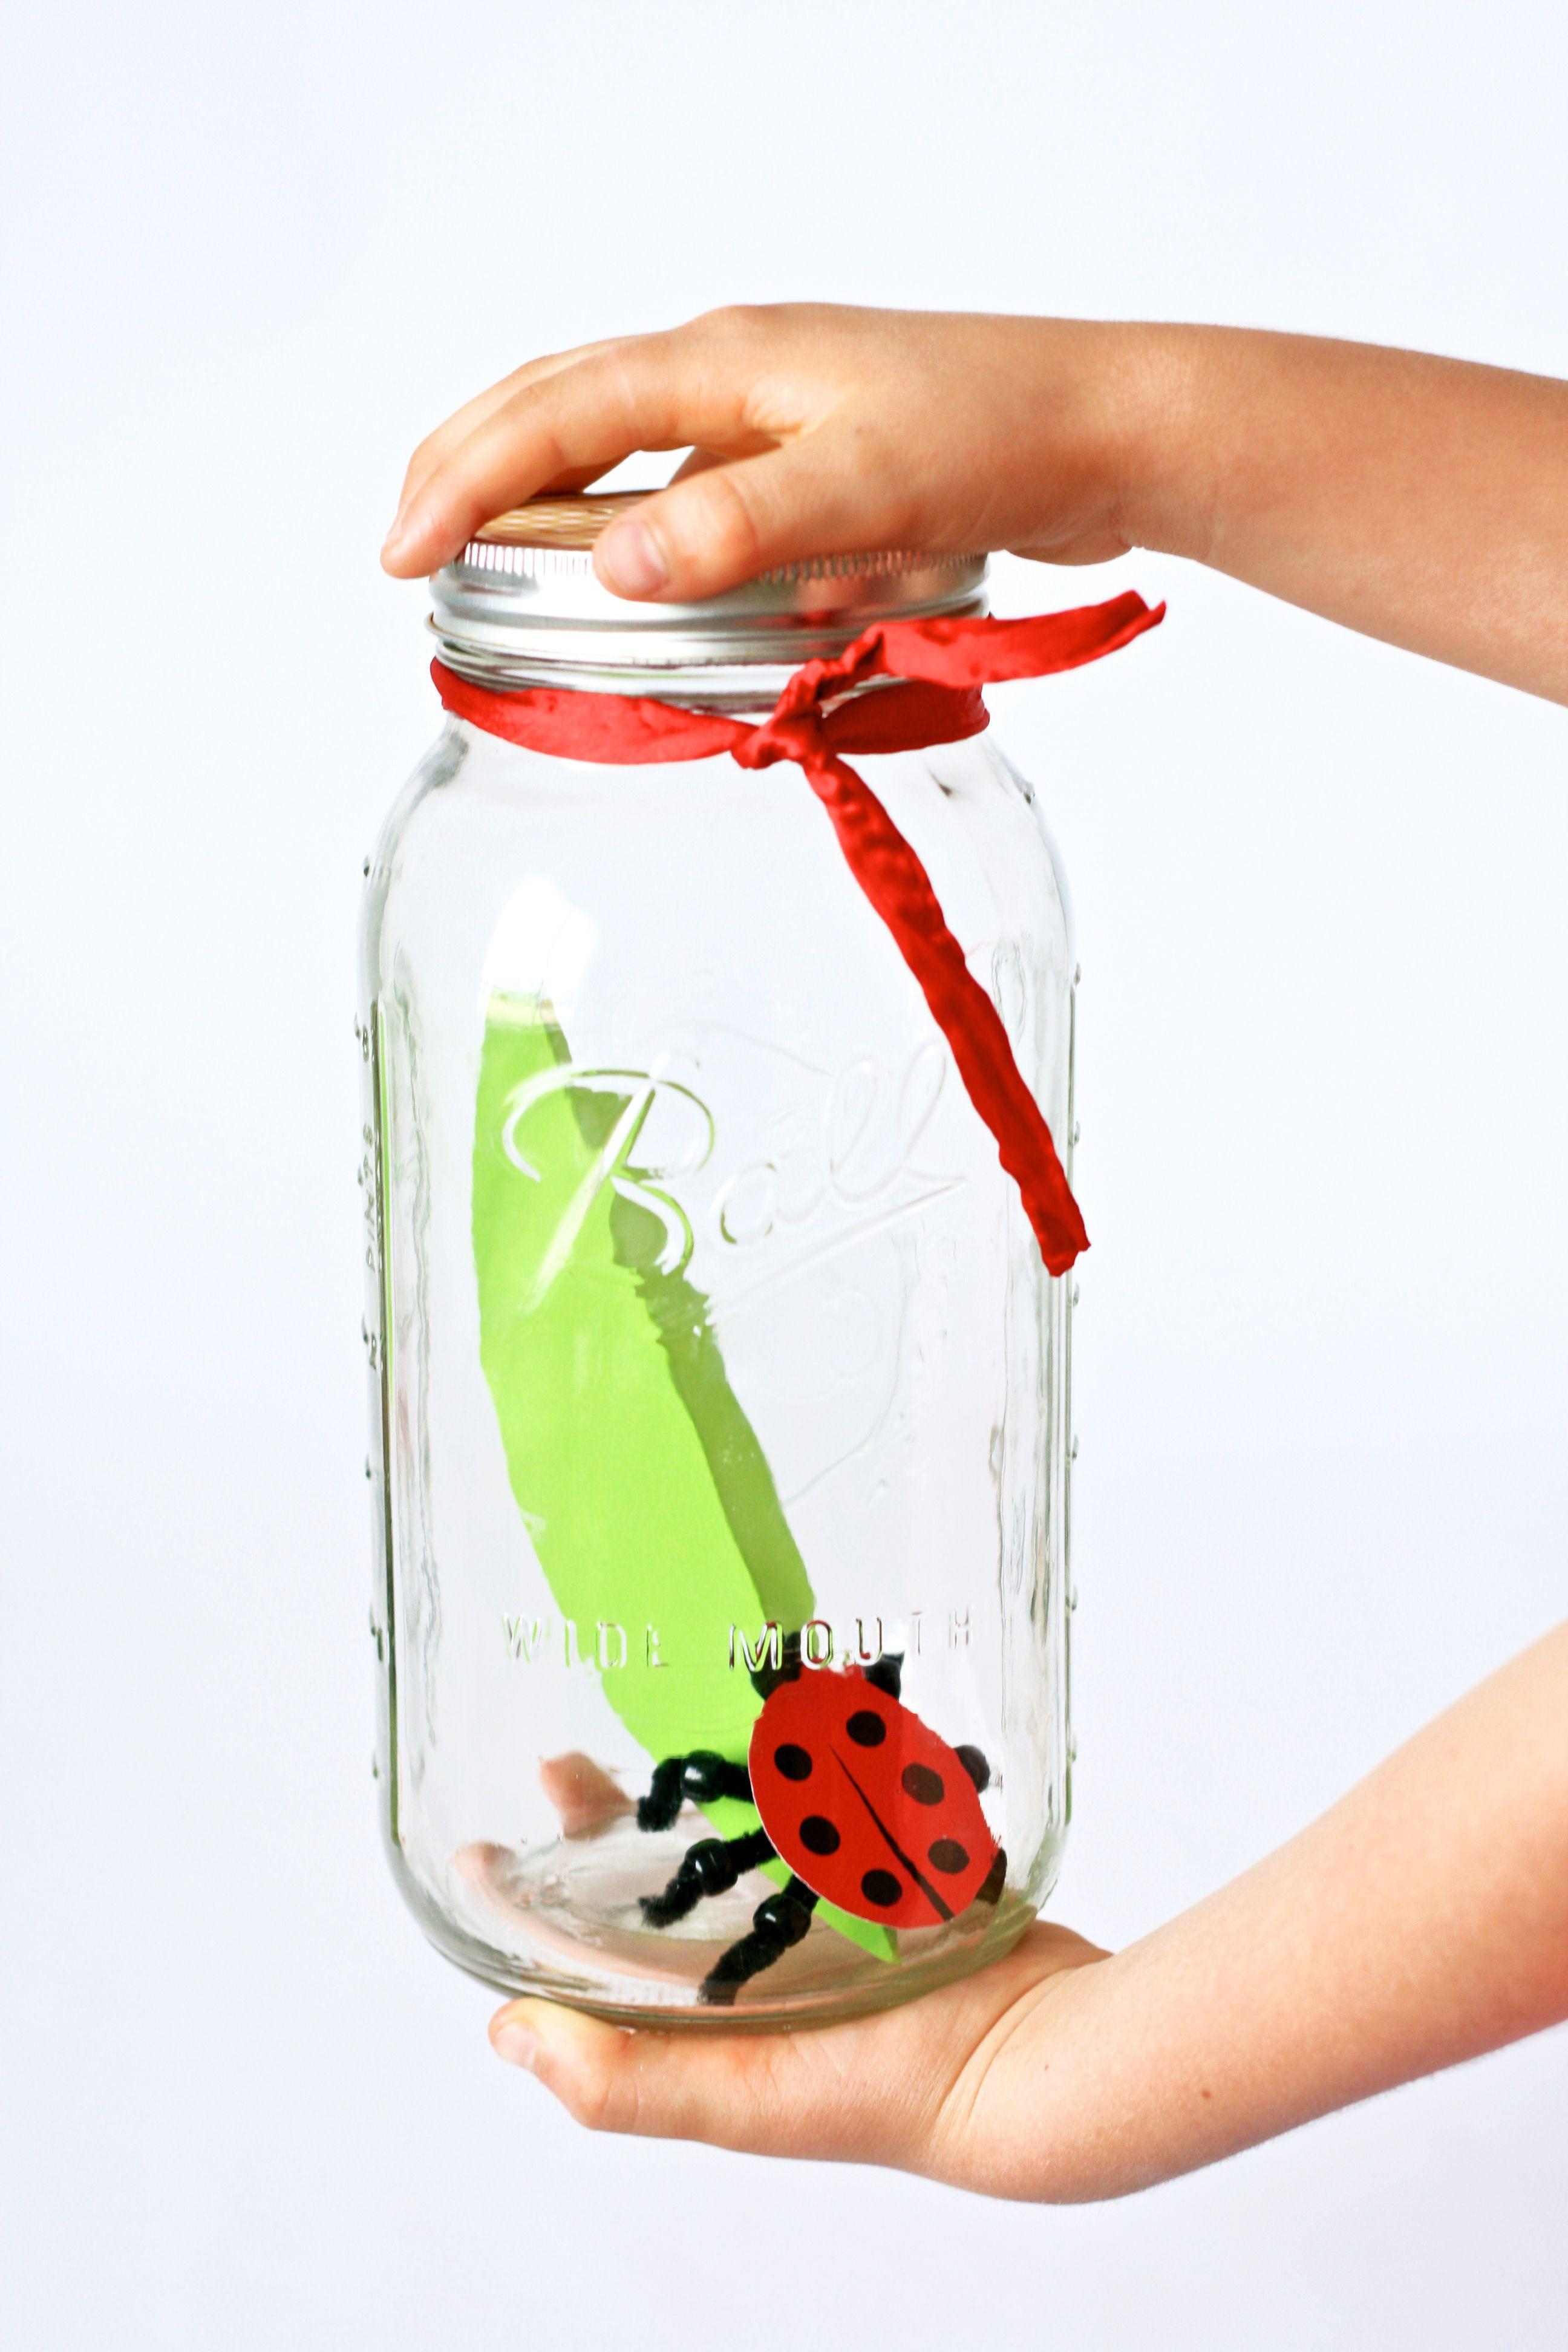 Kids Crafts Make A Pet Ladybug